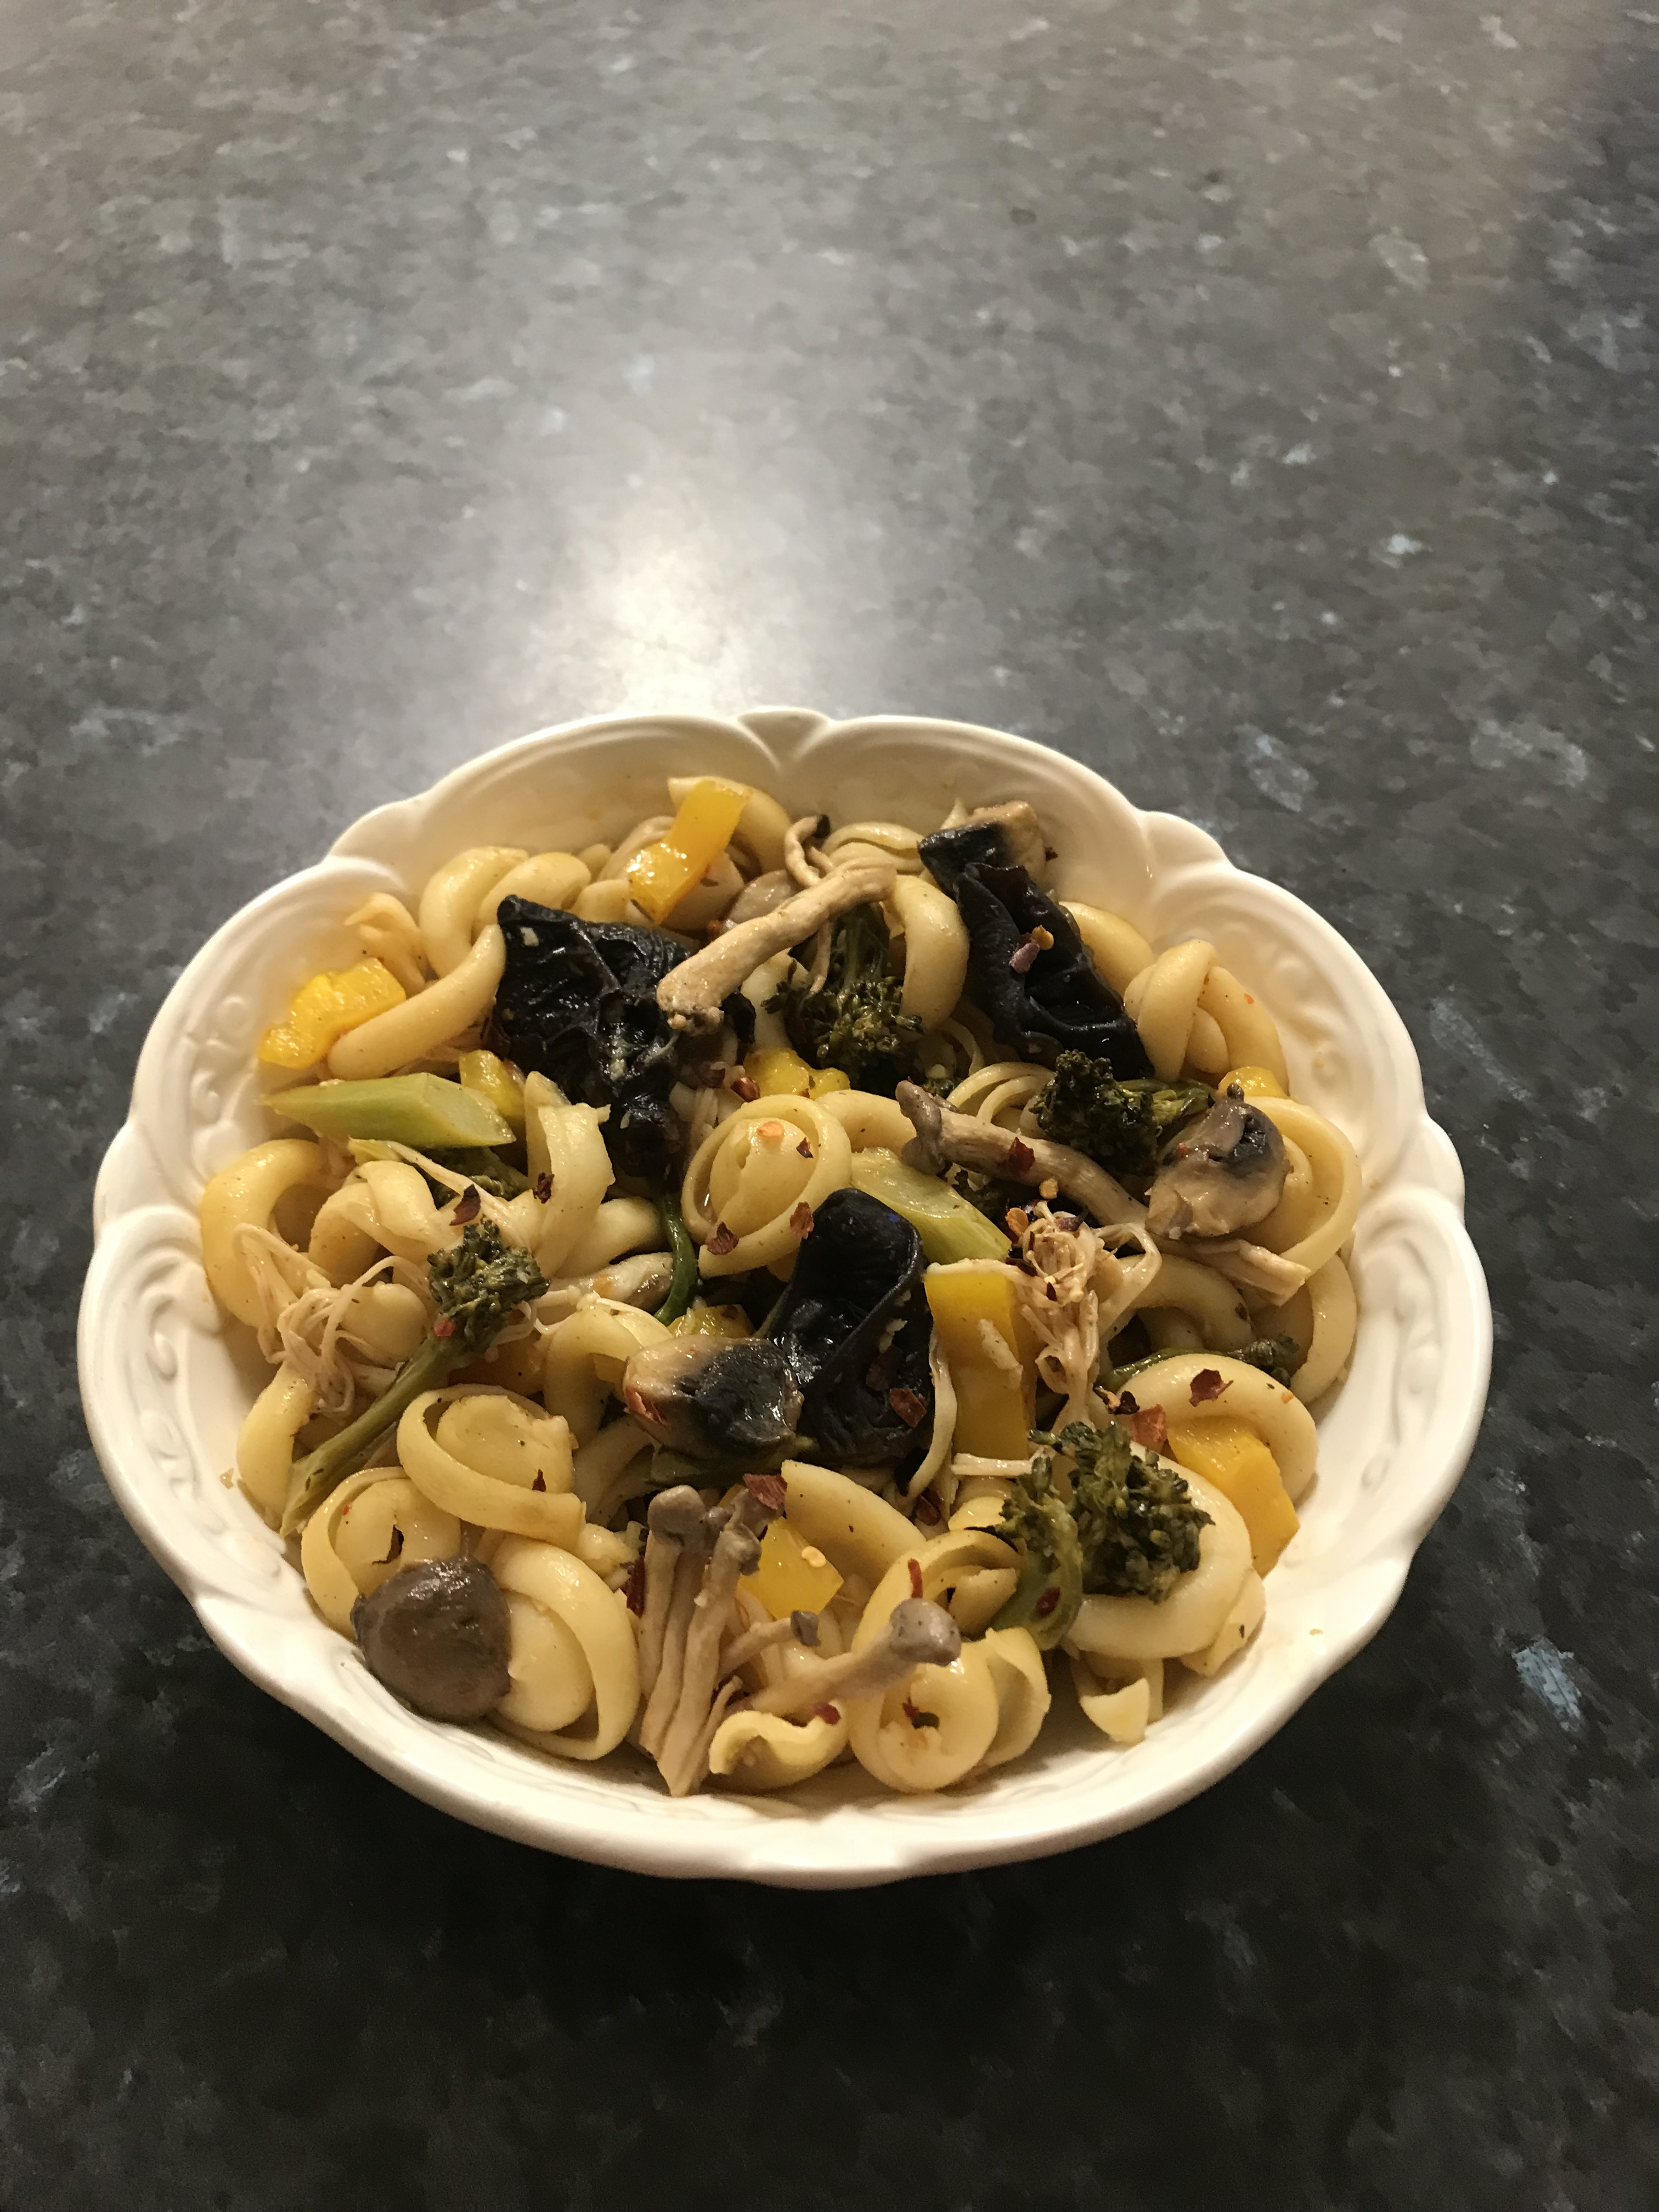 orrechiette mushrooms and vegetables in sambal chicken sauce.jpg